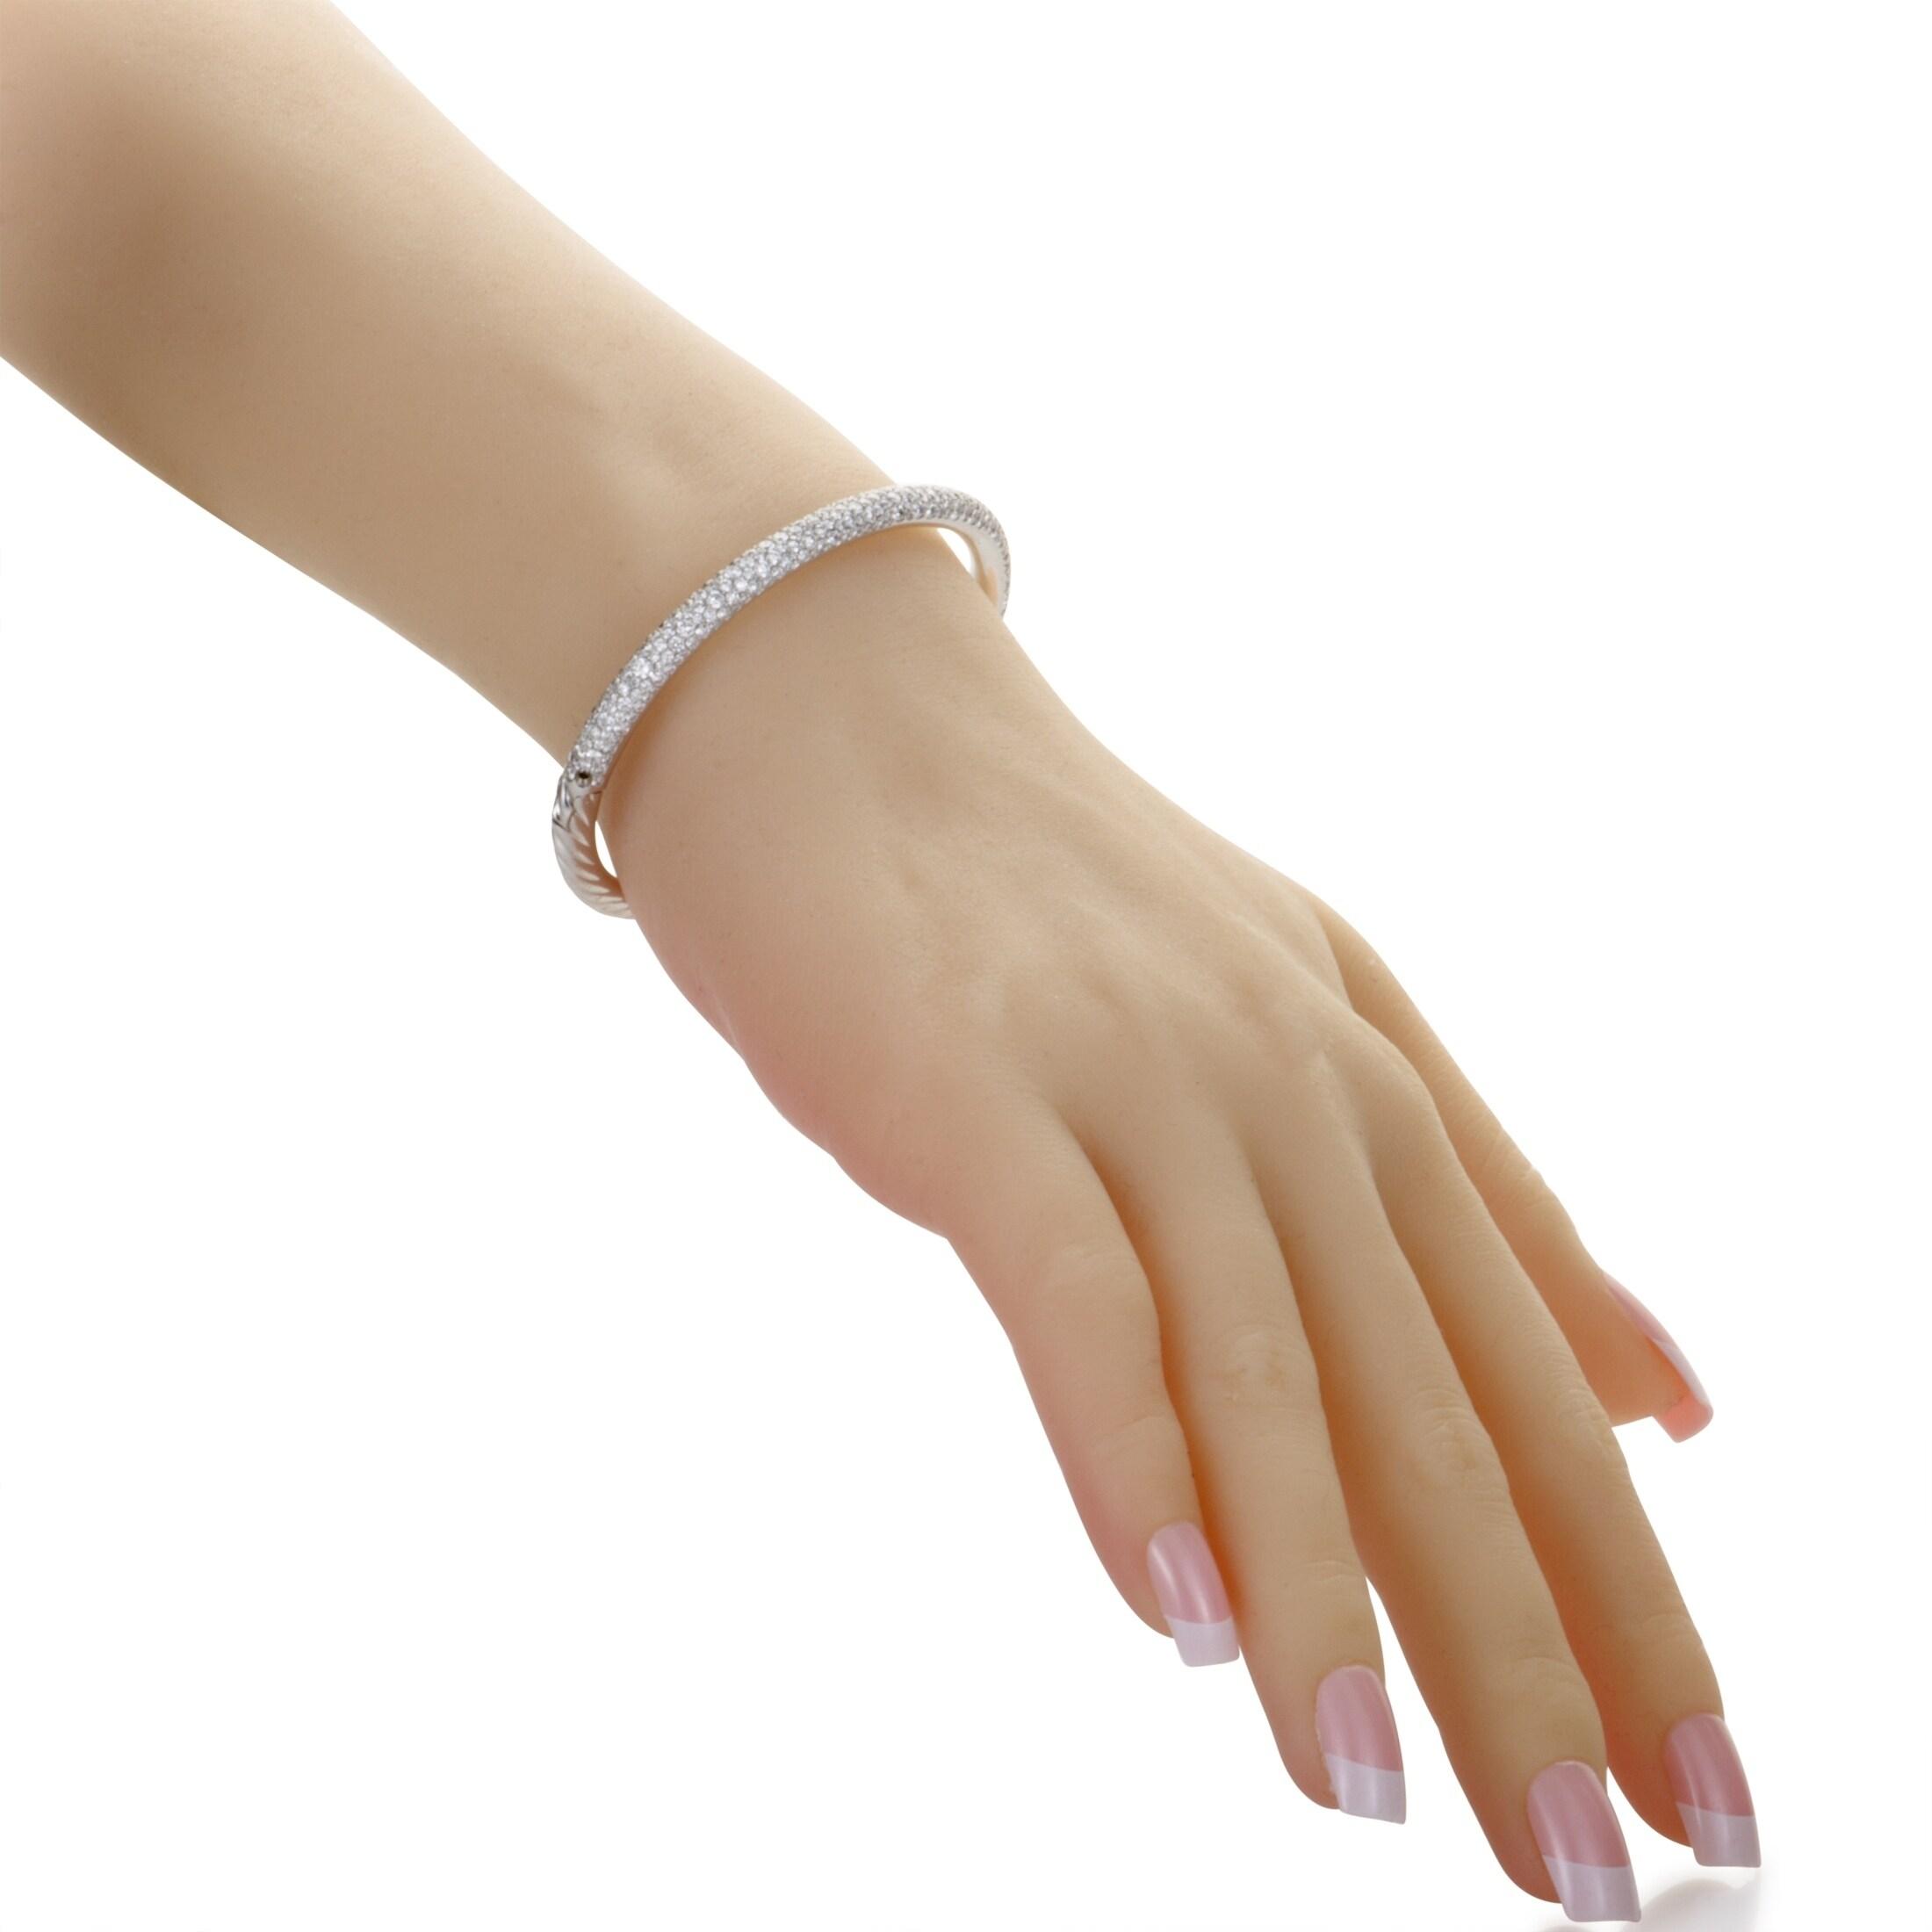 David Yurman Limited Edition White Gold Diamond Pave Cable Bangle Bracelet On Free Shipping Today 20583188